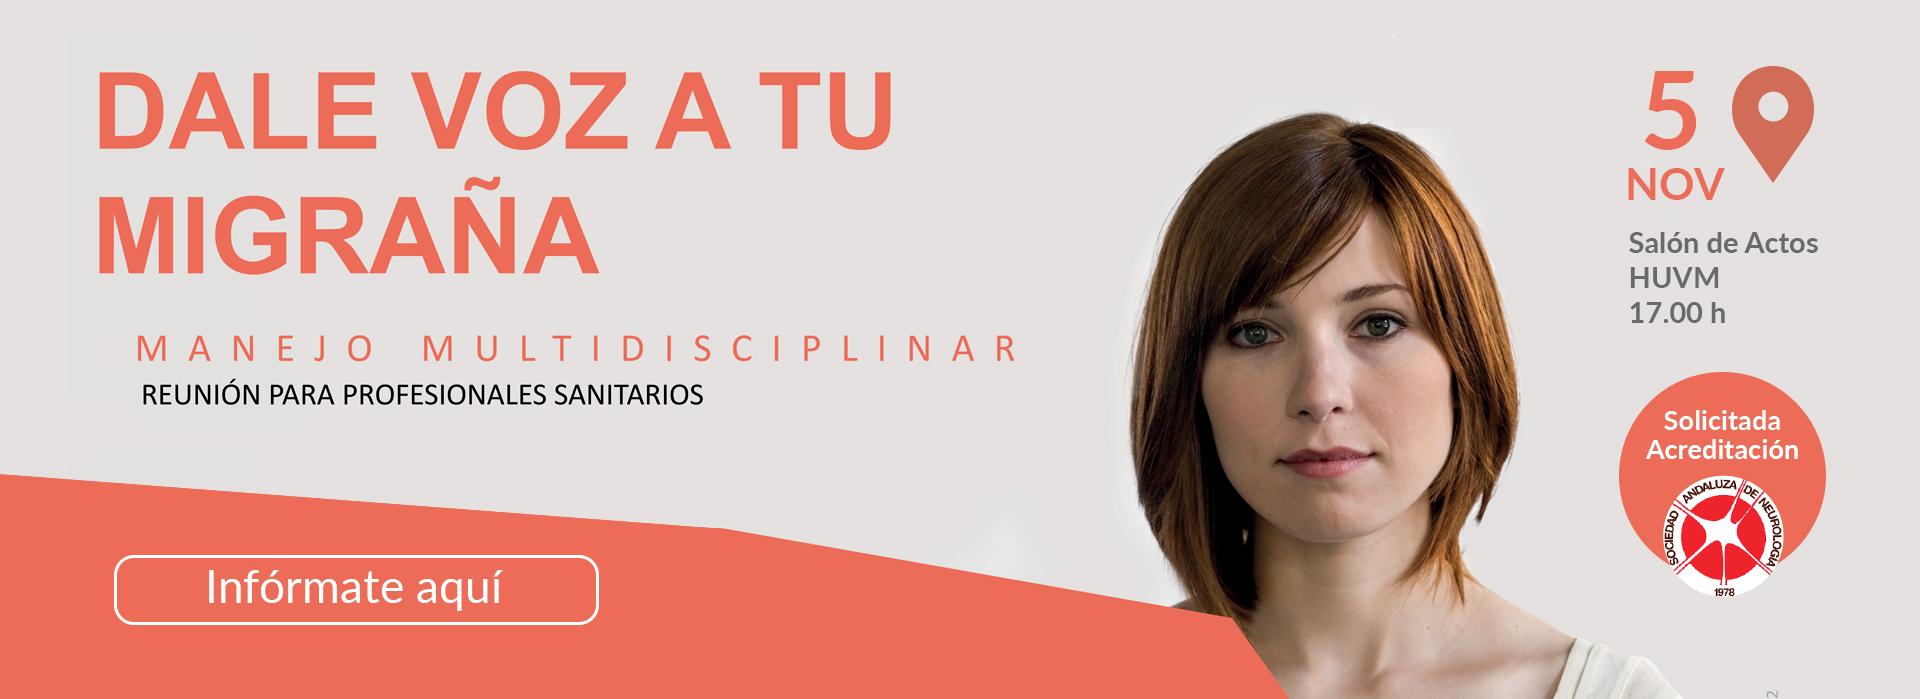 Jornada Dale voz a tu migraña Hospital Macarena